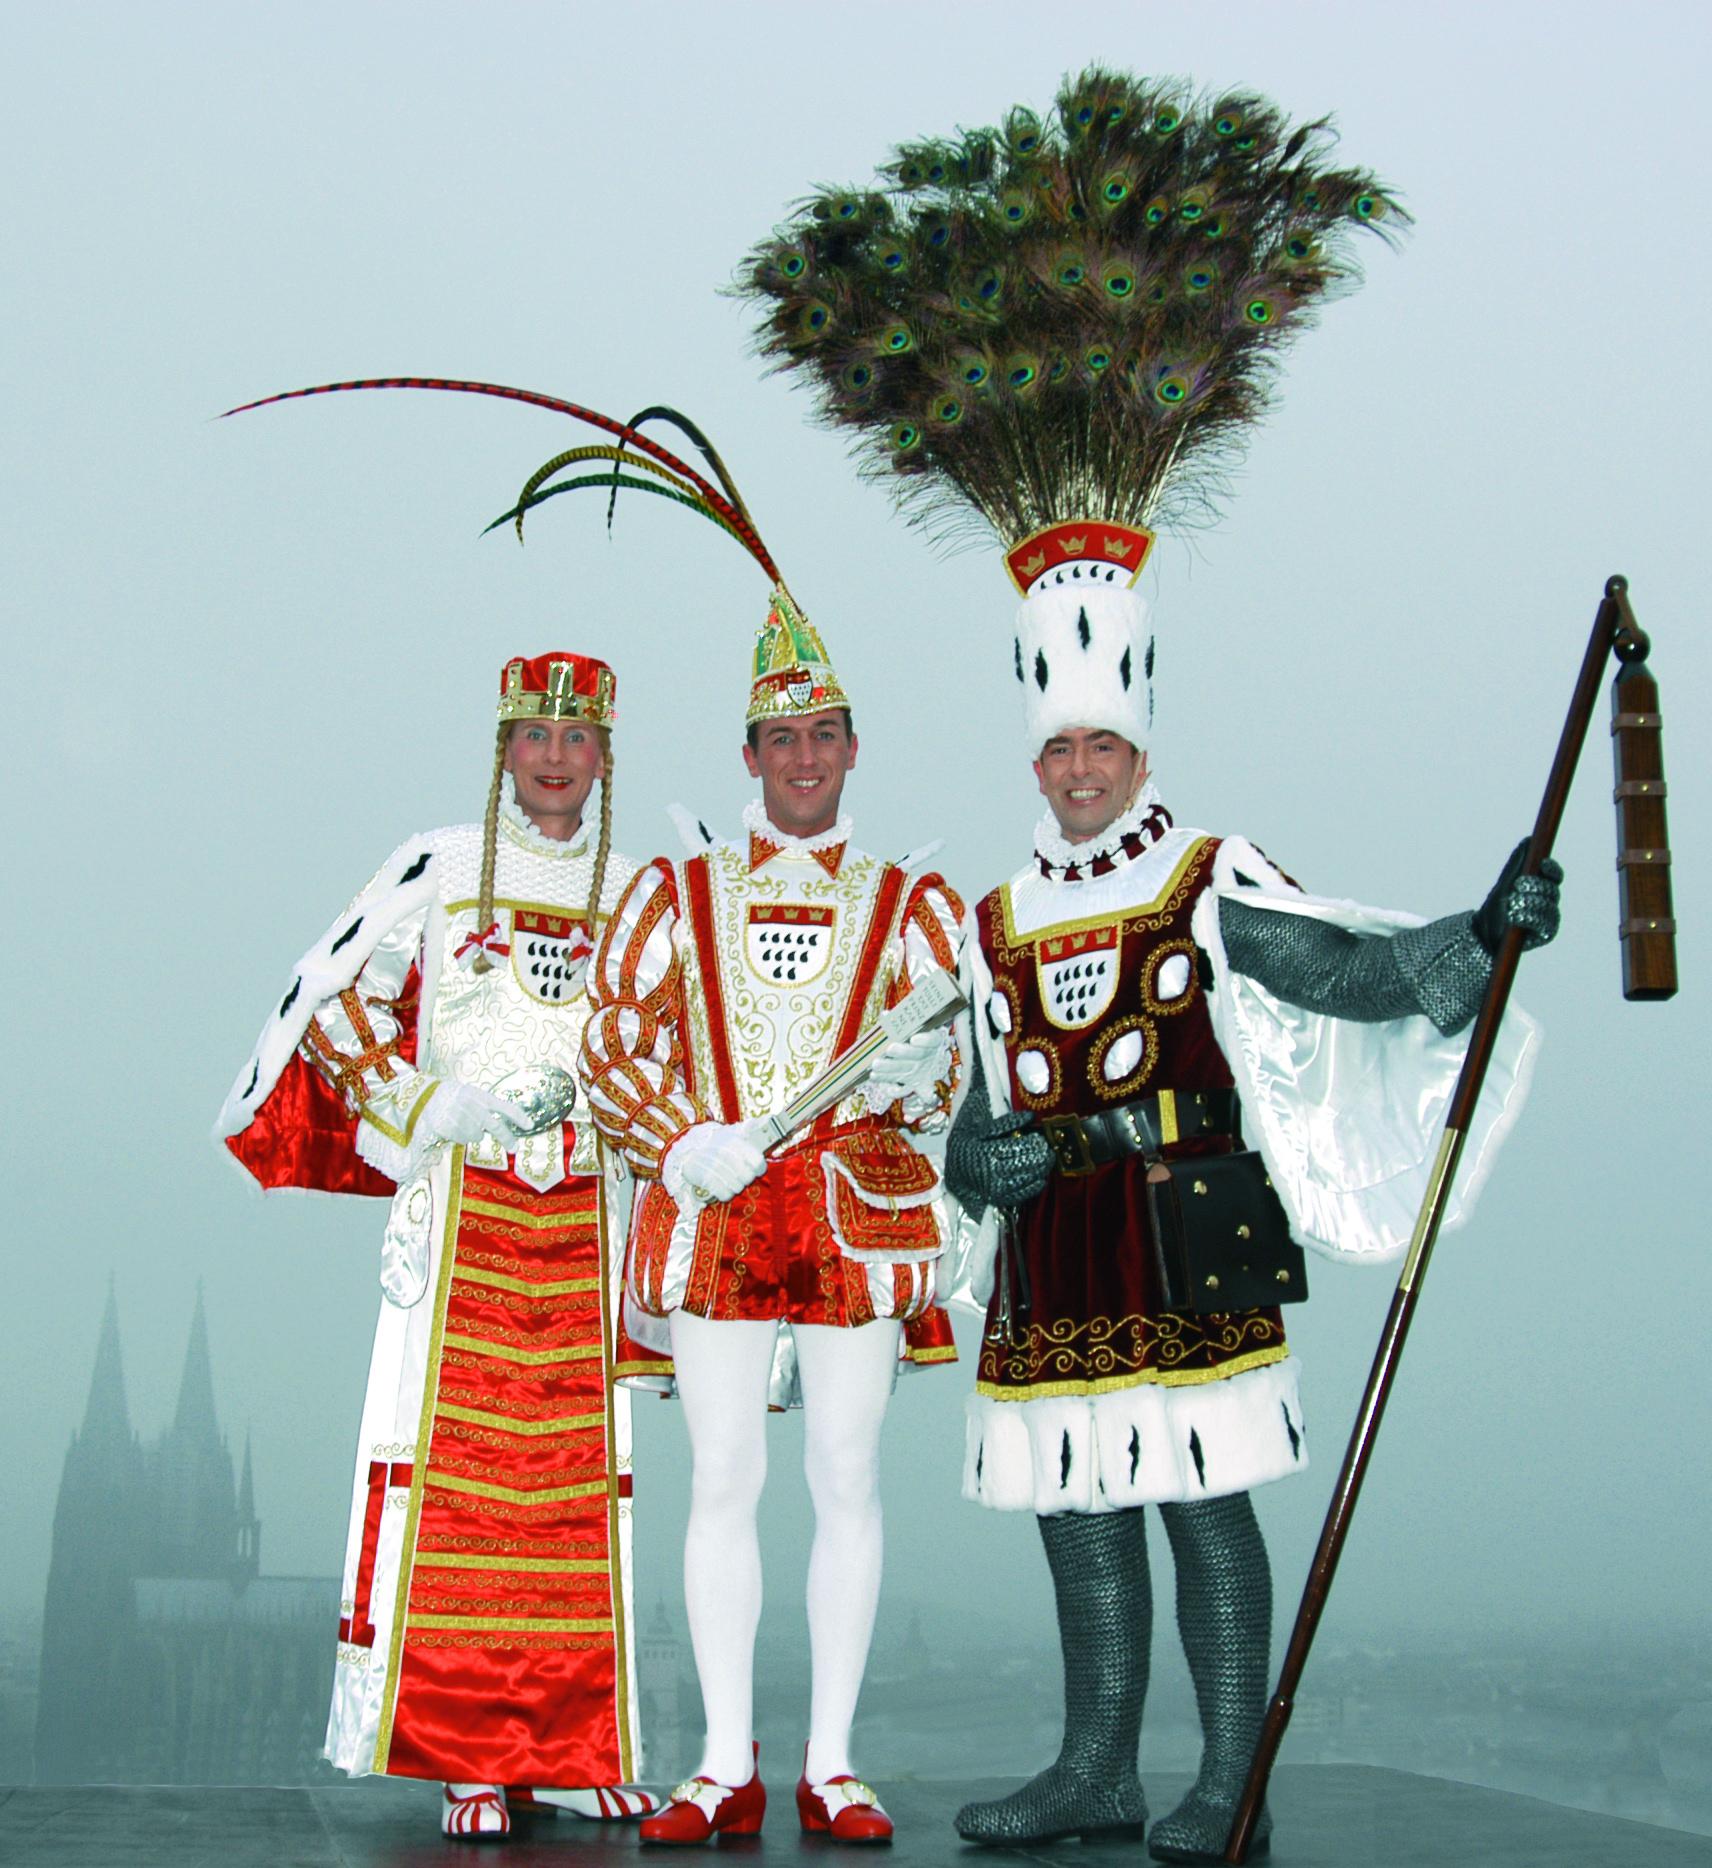 Das Kölner Dreigestirn 2005 (v.l. Jungfrau, Prinz, Bauer)